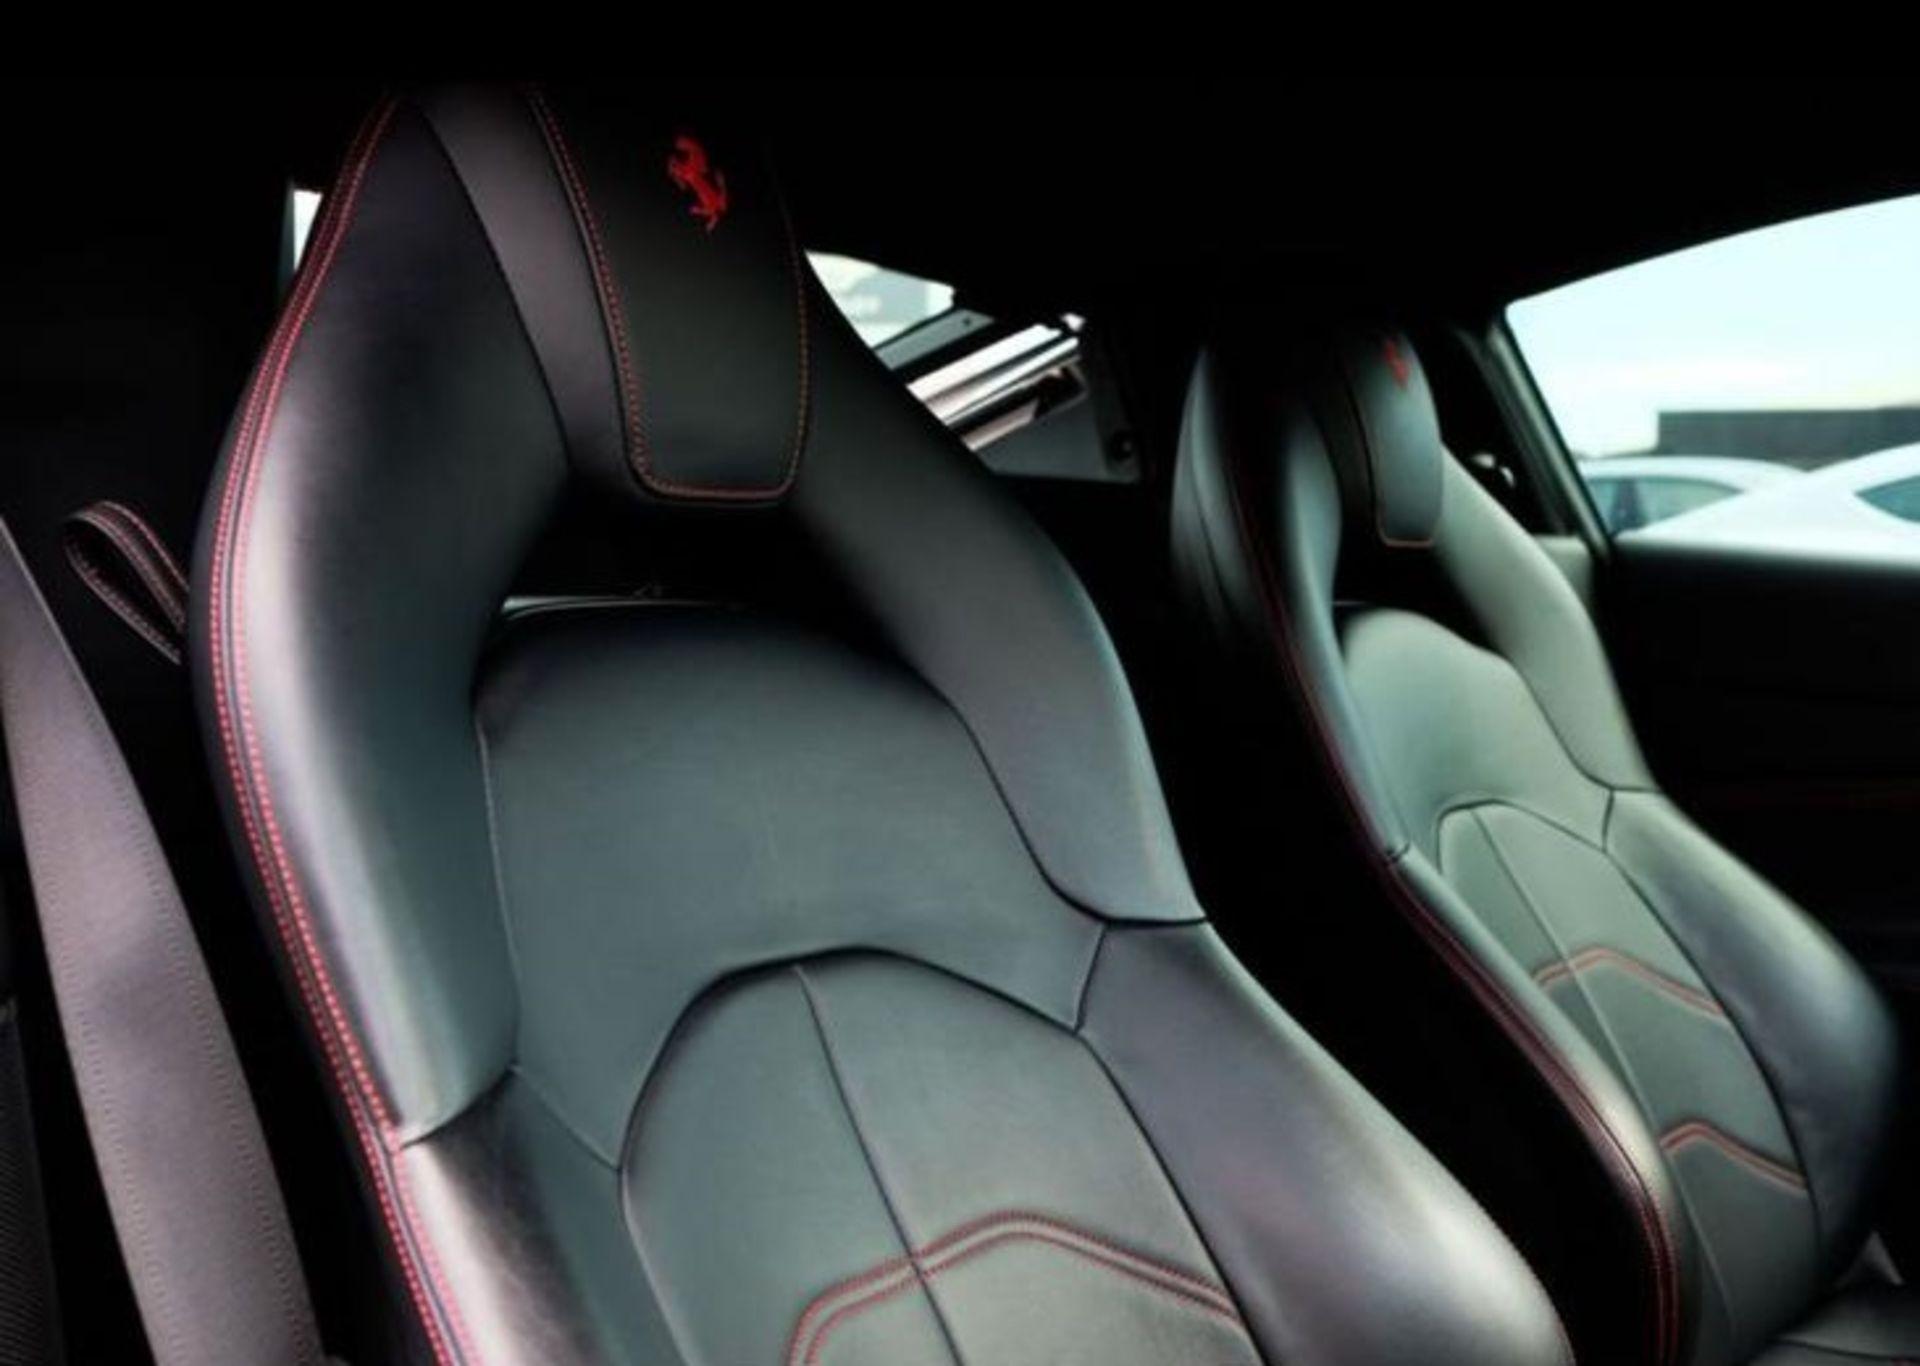 2016 FERRARI 488 GTB 2DR RED COUPE, PETROL, AUTOMATIC, 11K MILES, LEFT HAND DRIVE *NO VAT* - Image 19 of 22